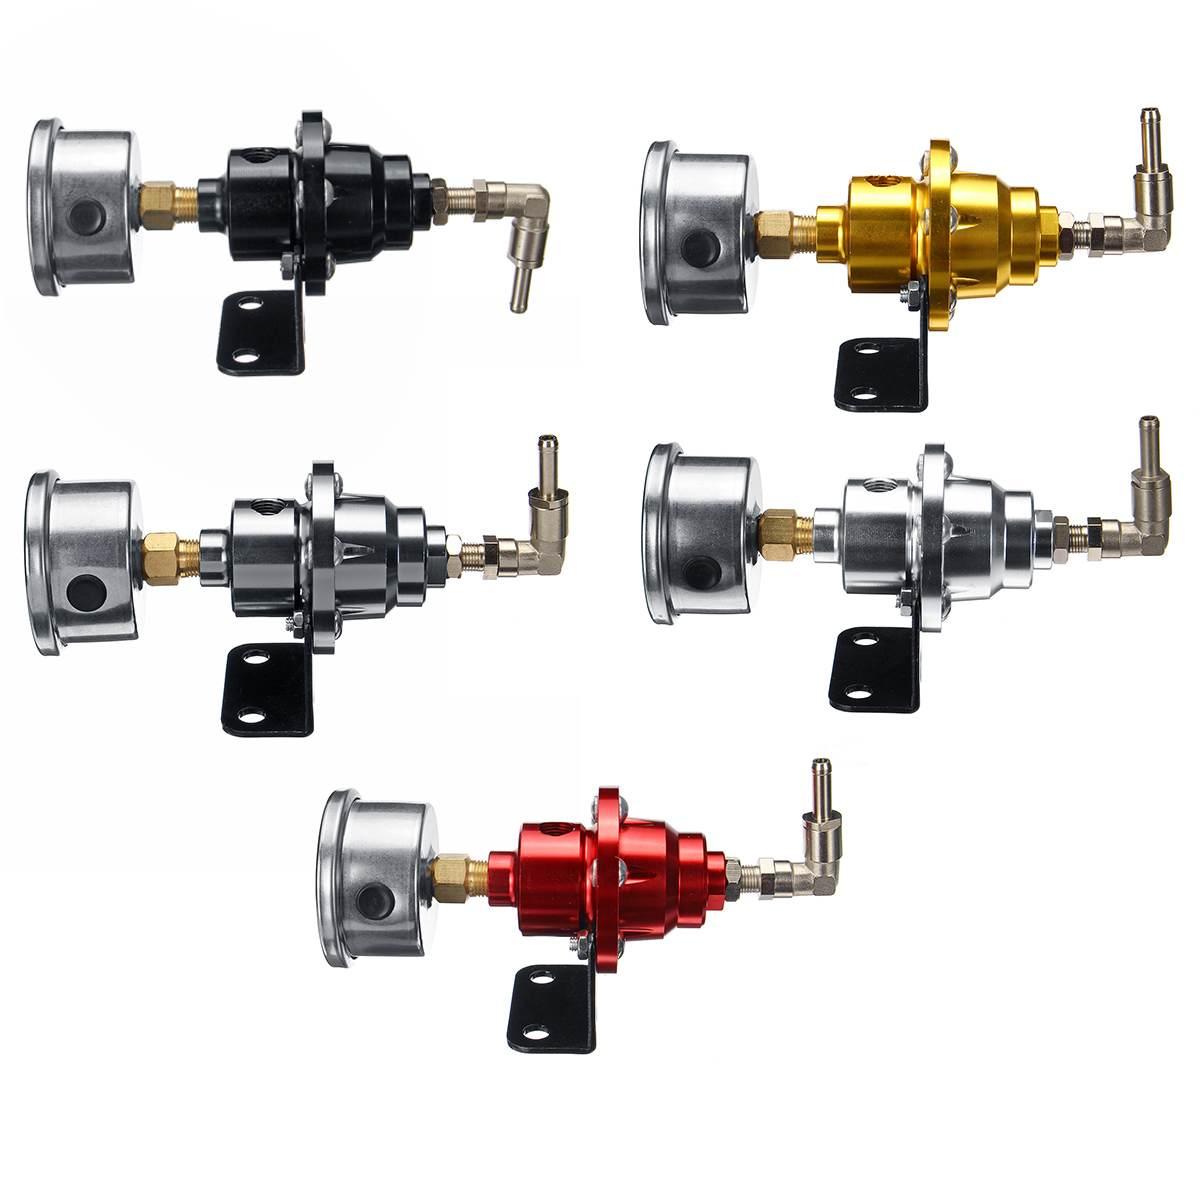 6 Color Black Titanium Red Gold Silver Blue Universal Adjustable Aluminum Fuel Pressure Regulator With Gauge Kit